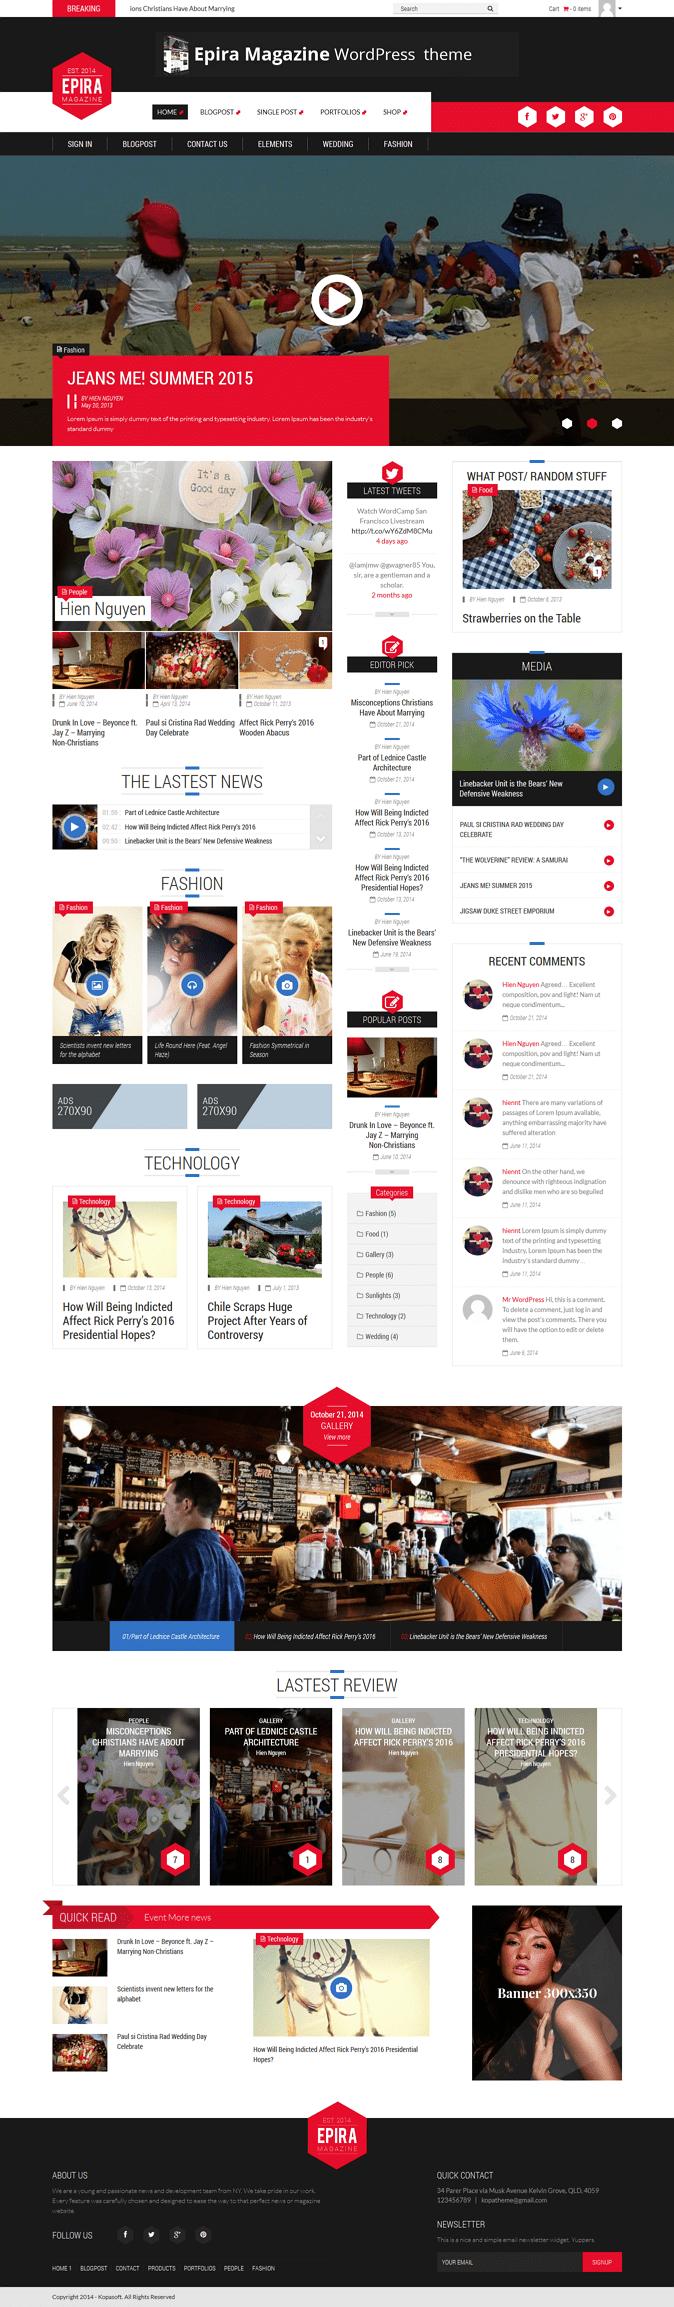 Stunning, Modern, Customizable is what Epira magazine WordPress theme brings to customers who ar ...